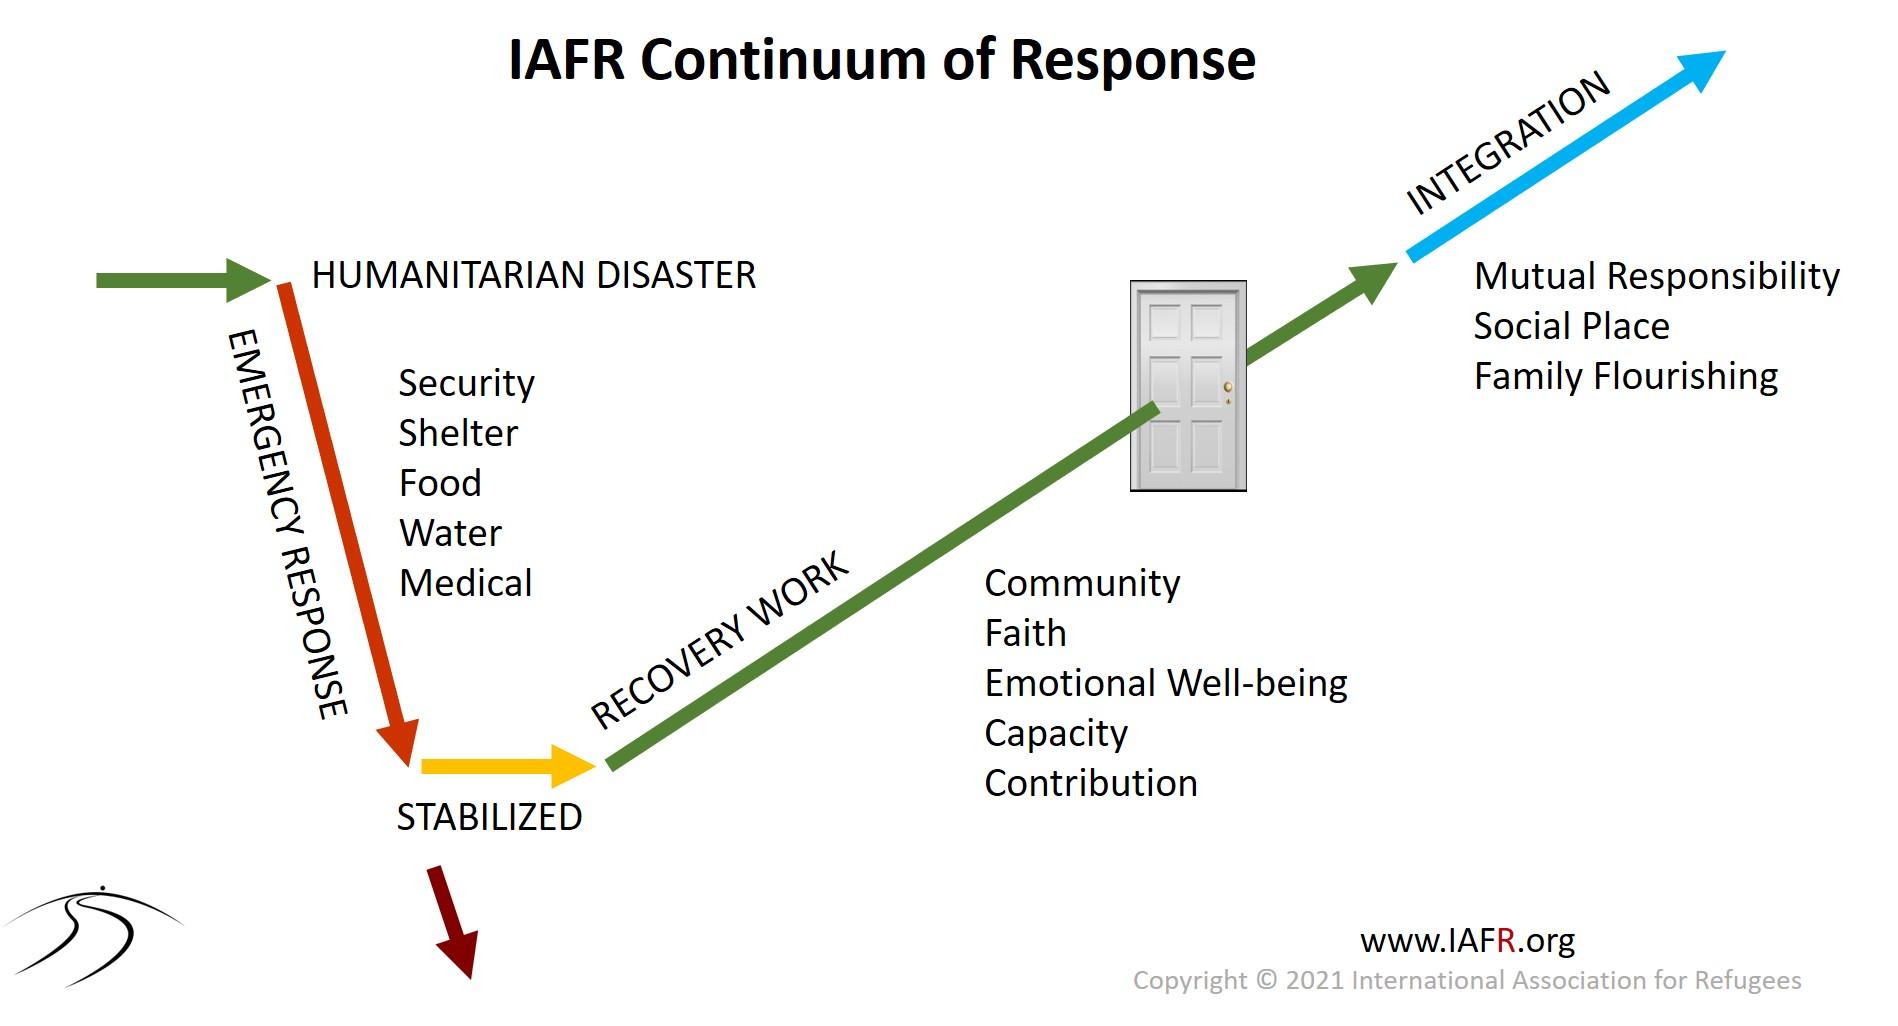 IAFR Continuum of Response